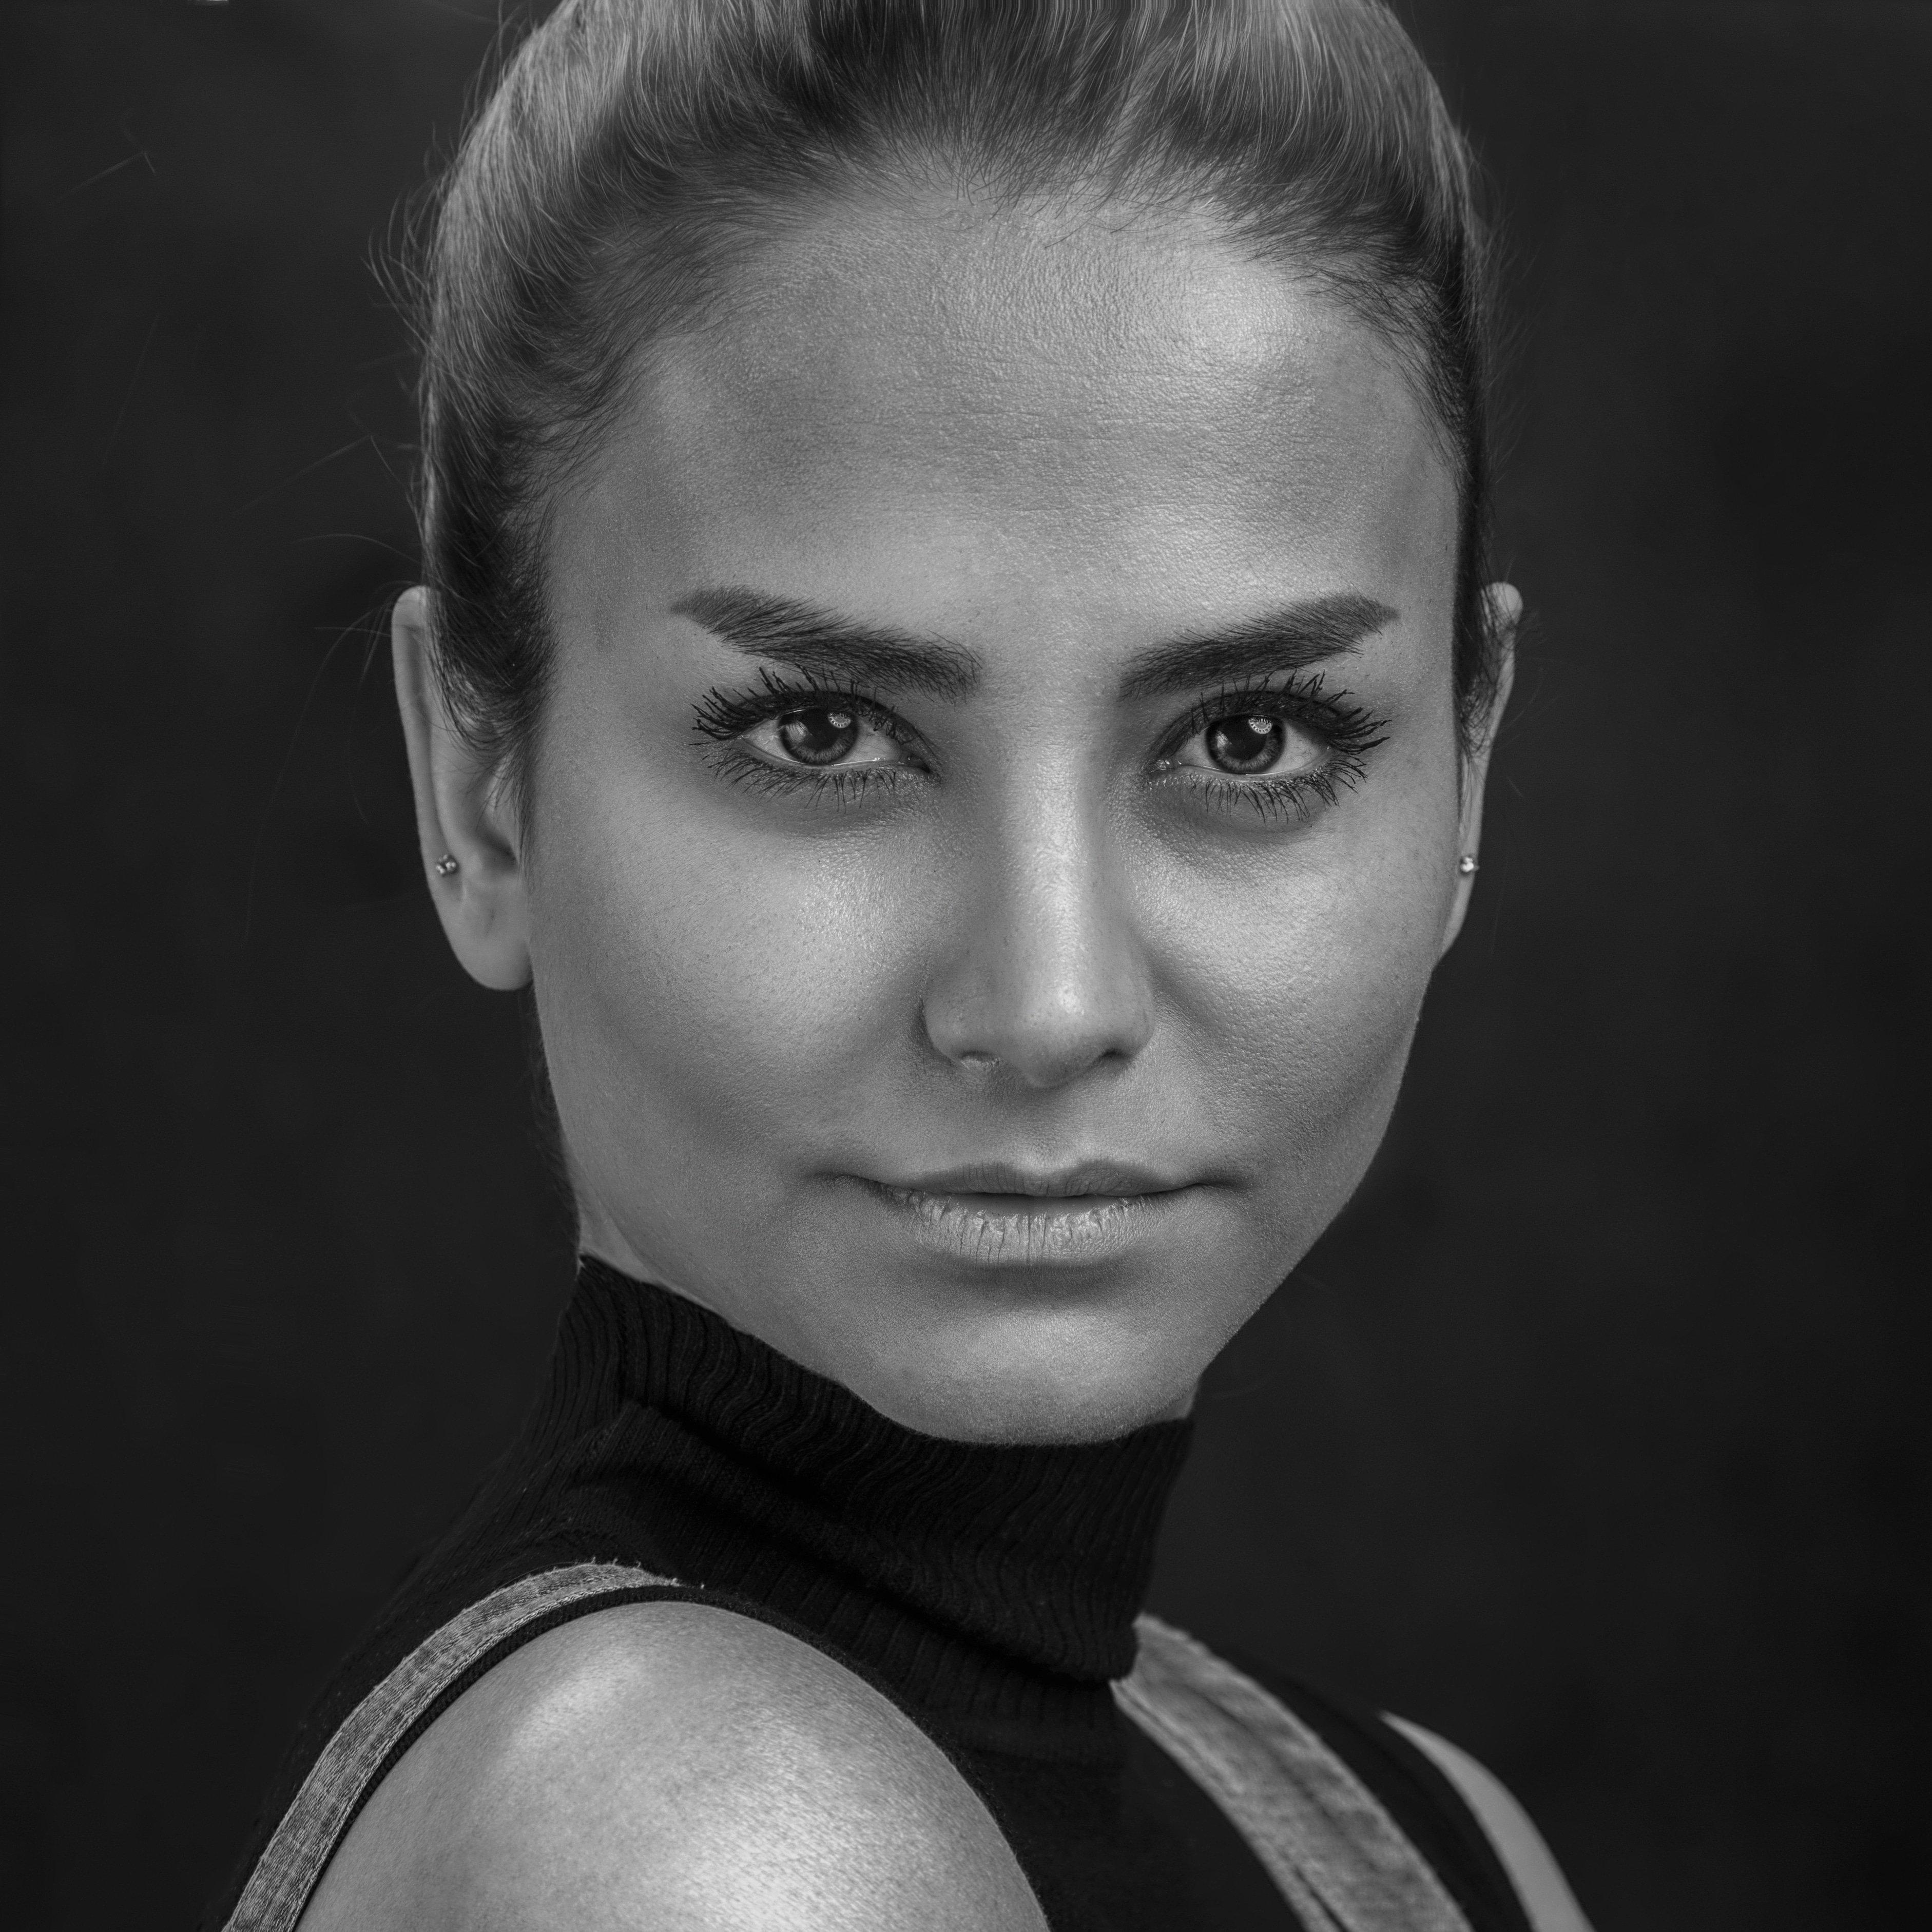 #famaleportrait#portrait, Saeinasab Vahidreza